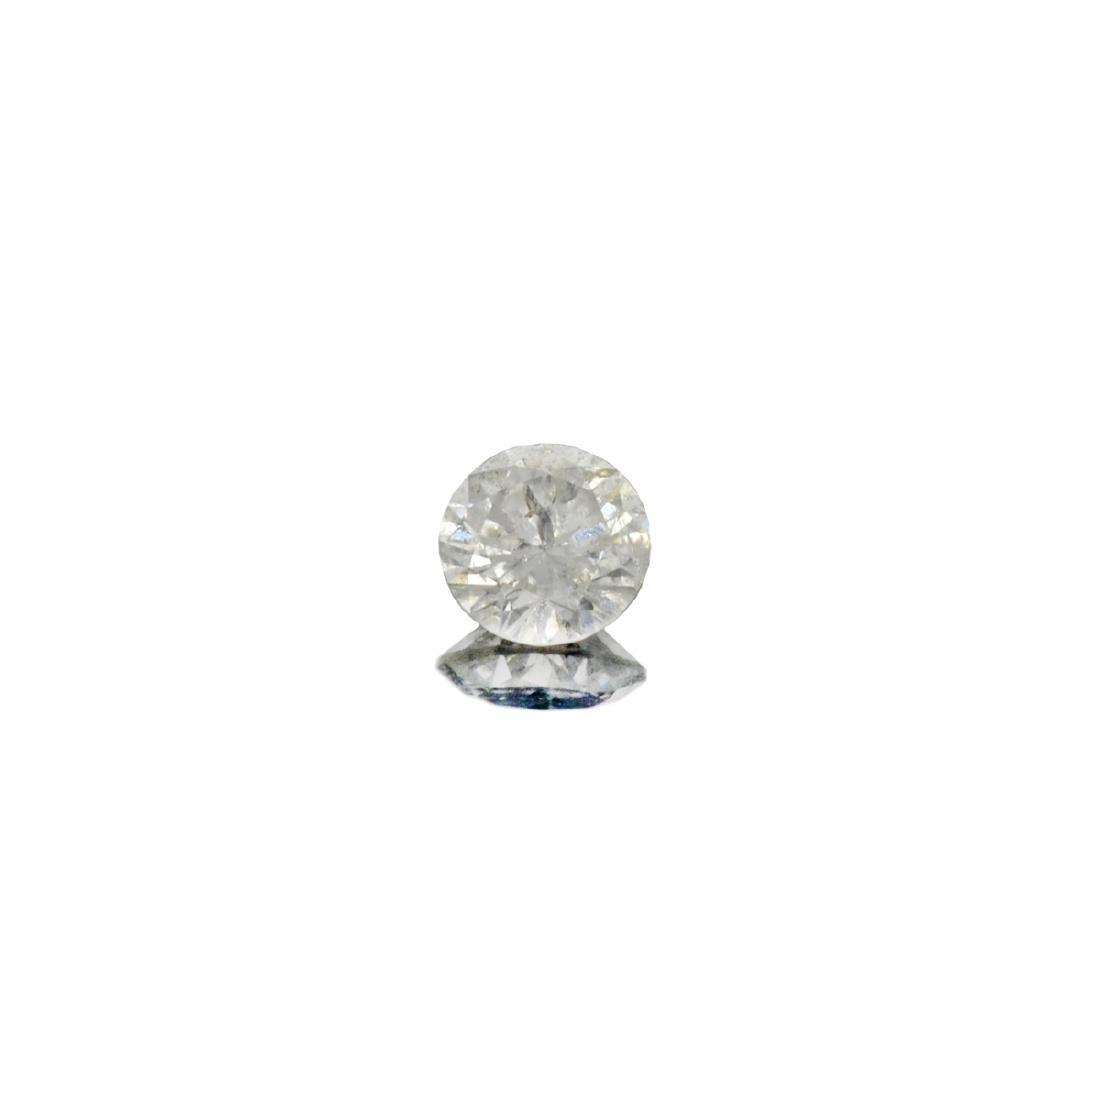 Fine Jewelry GIA Certified 0.16CT Round Brilliant Cut